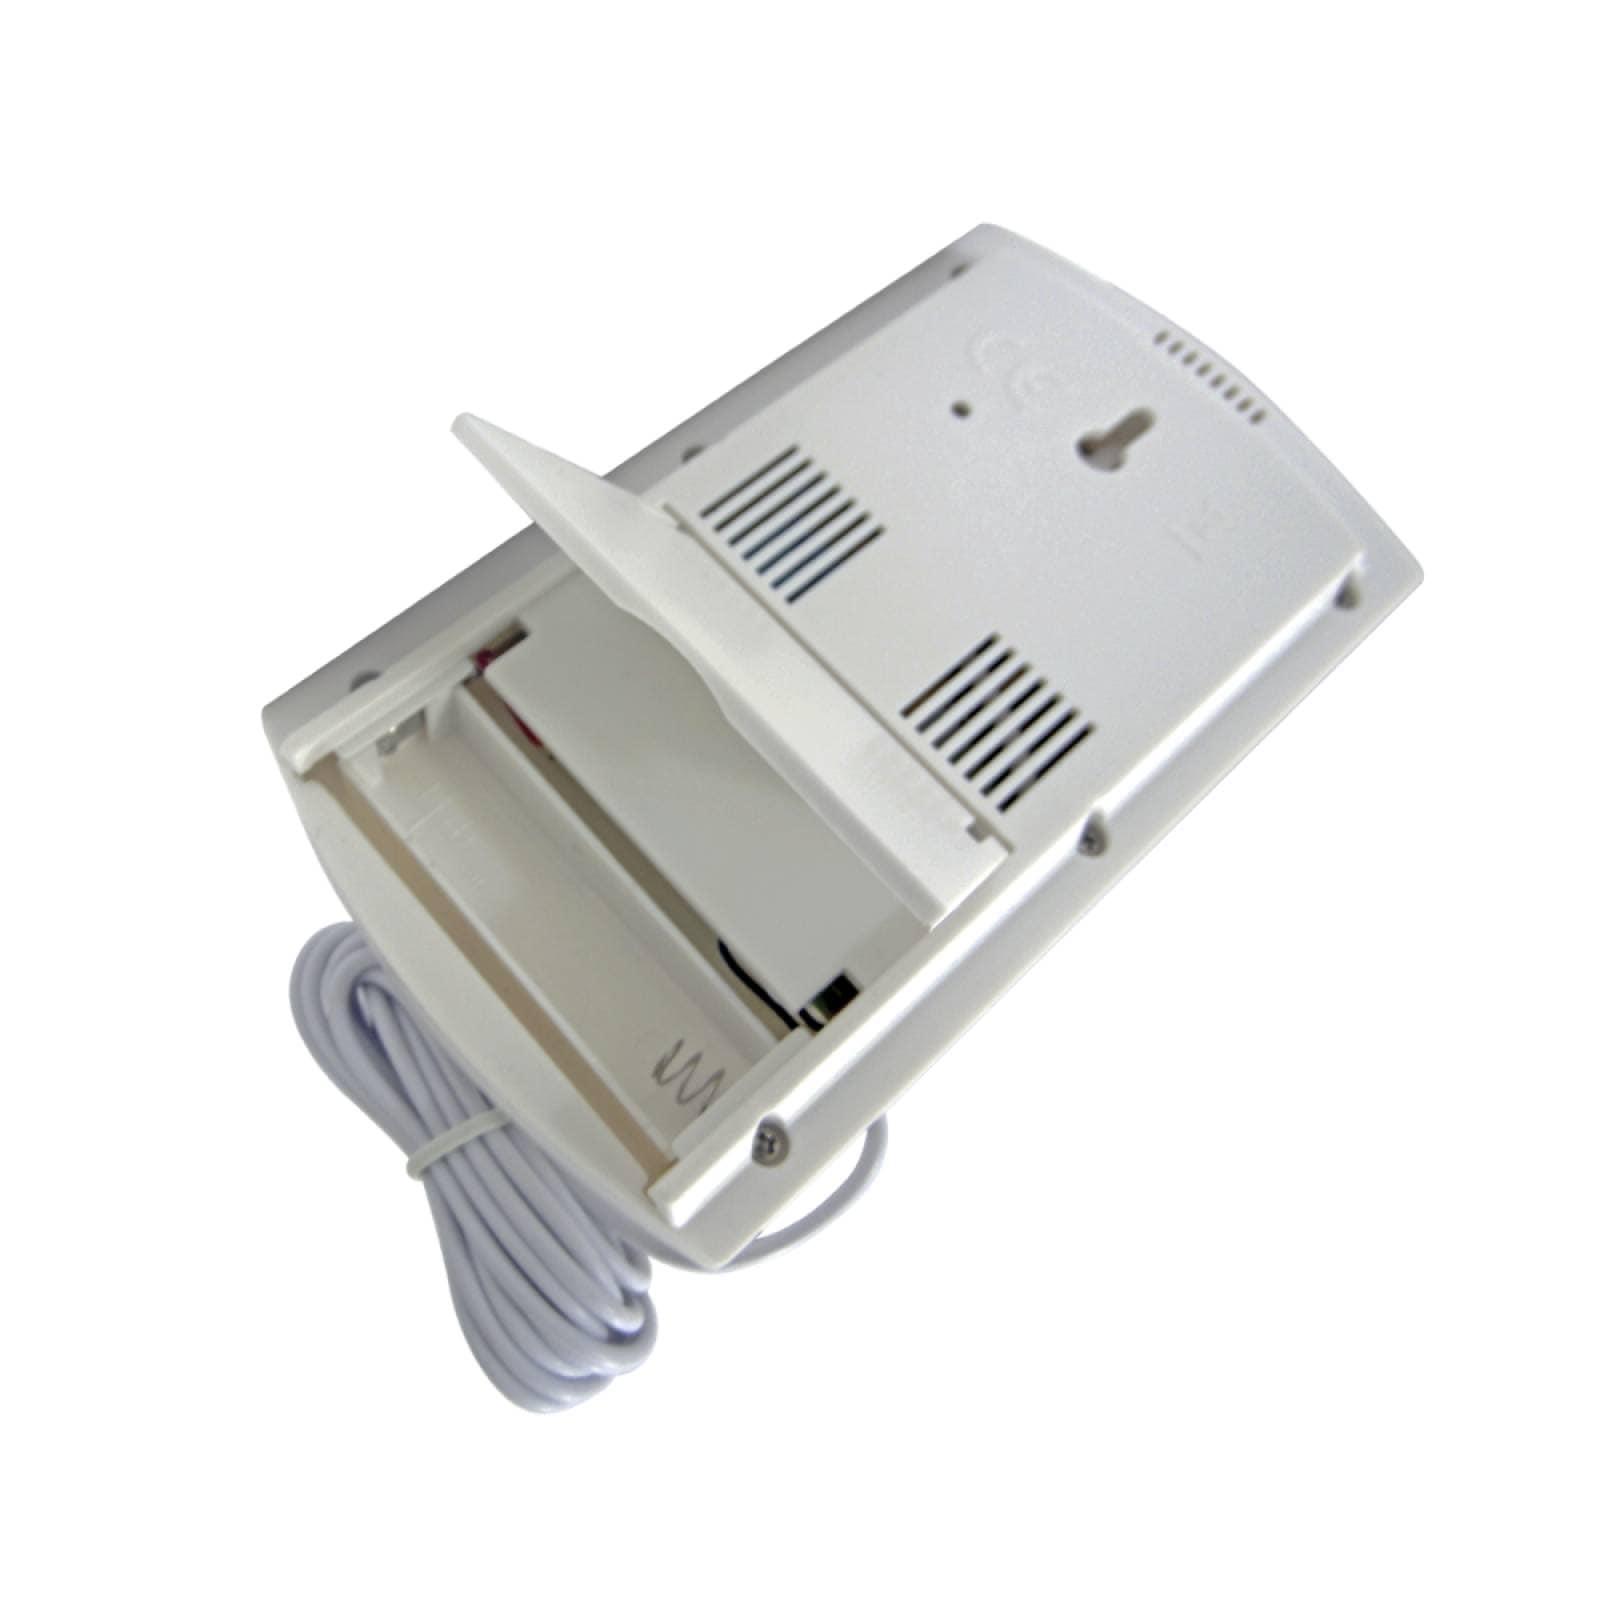 Termometro Digital Multifunciones Higrometro,alarma ,humeda